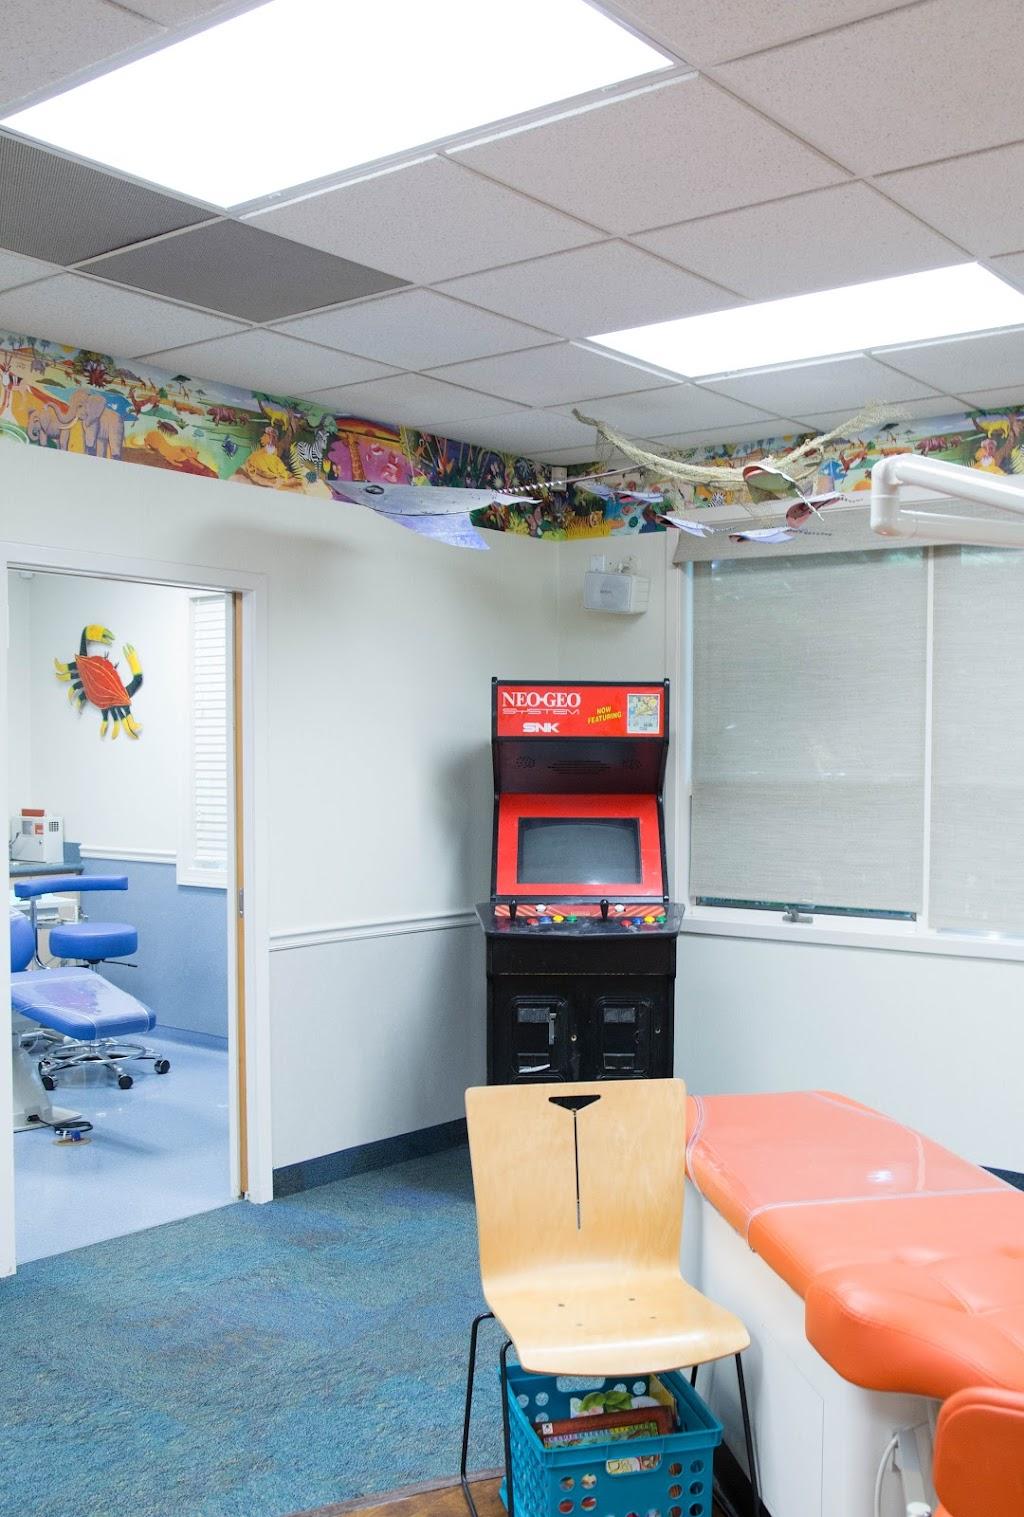 Spangler, Rohlfing & Lambert DDS-Pediatric Dentist - dentist    Photo 7 of 10   Address: 1544 N Peace Haven Rd, Winston-Salem, NC 27104, USA   Phone: (336) 768-1332